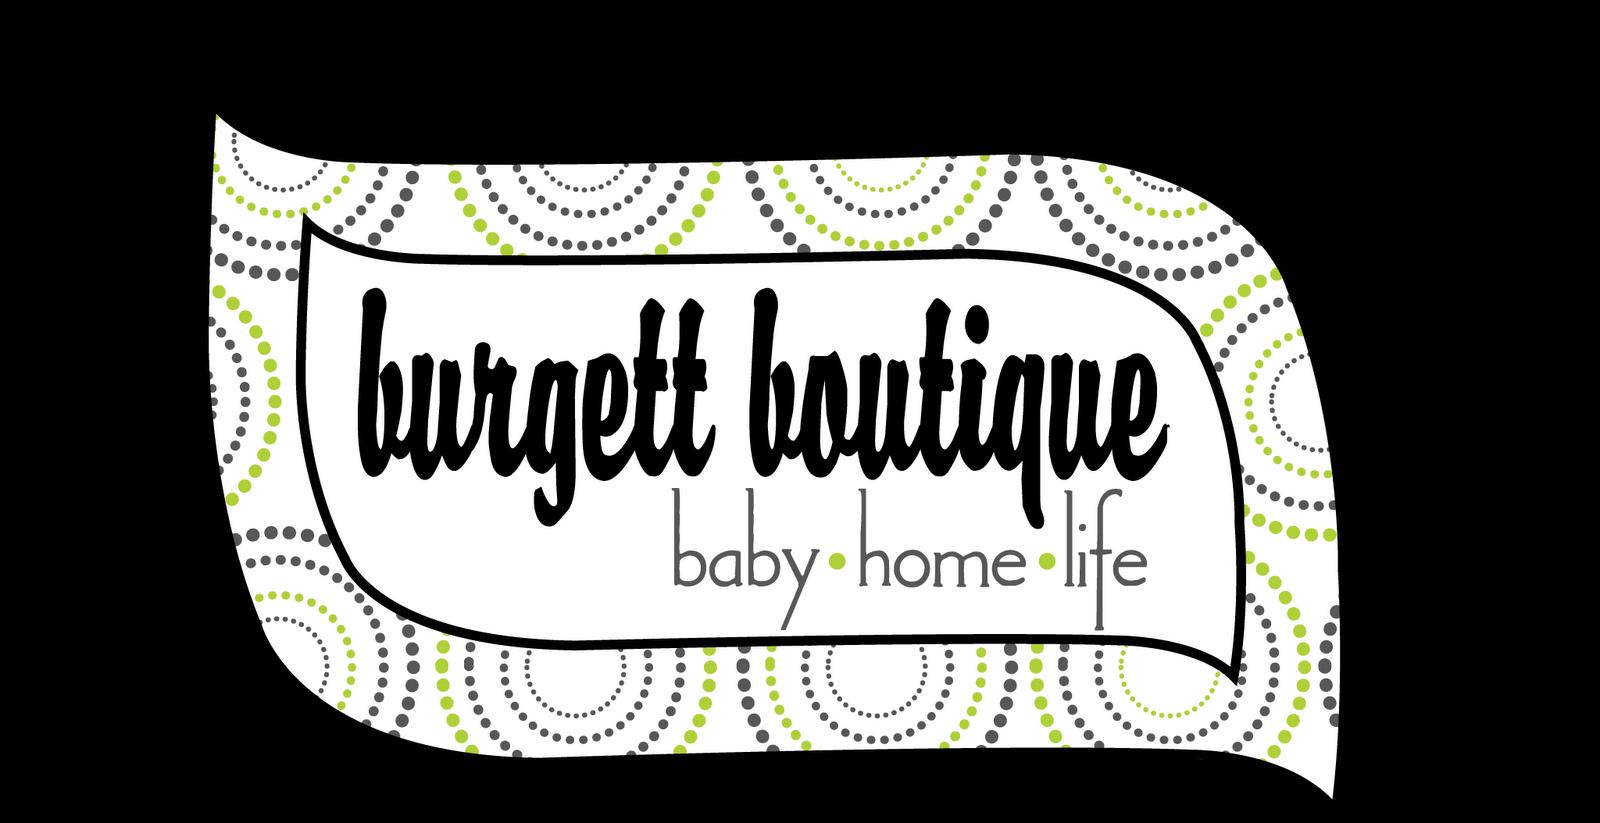 Burgett Boutique